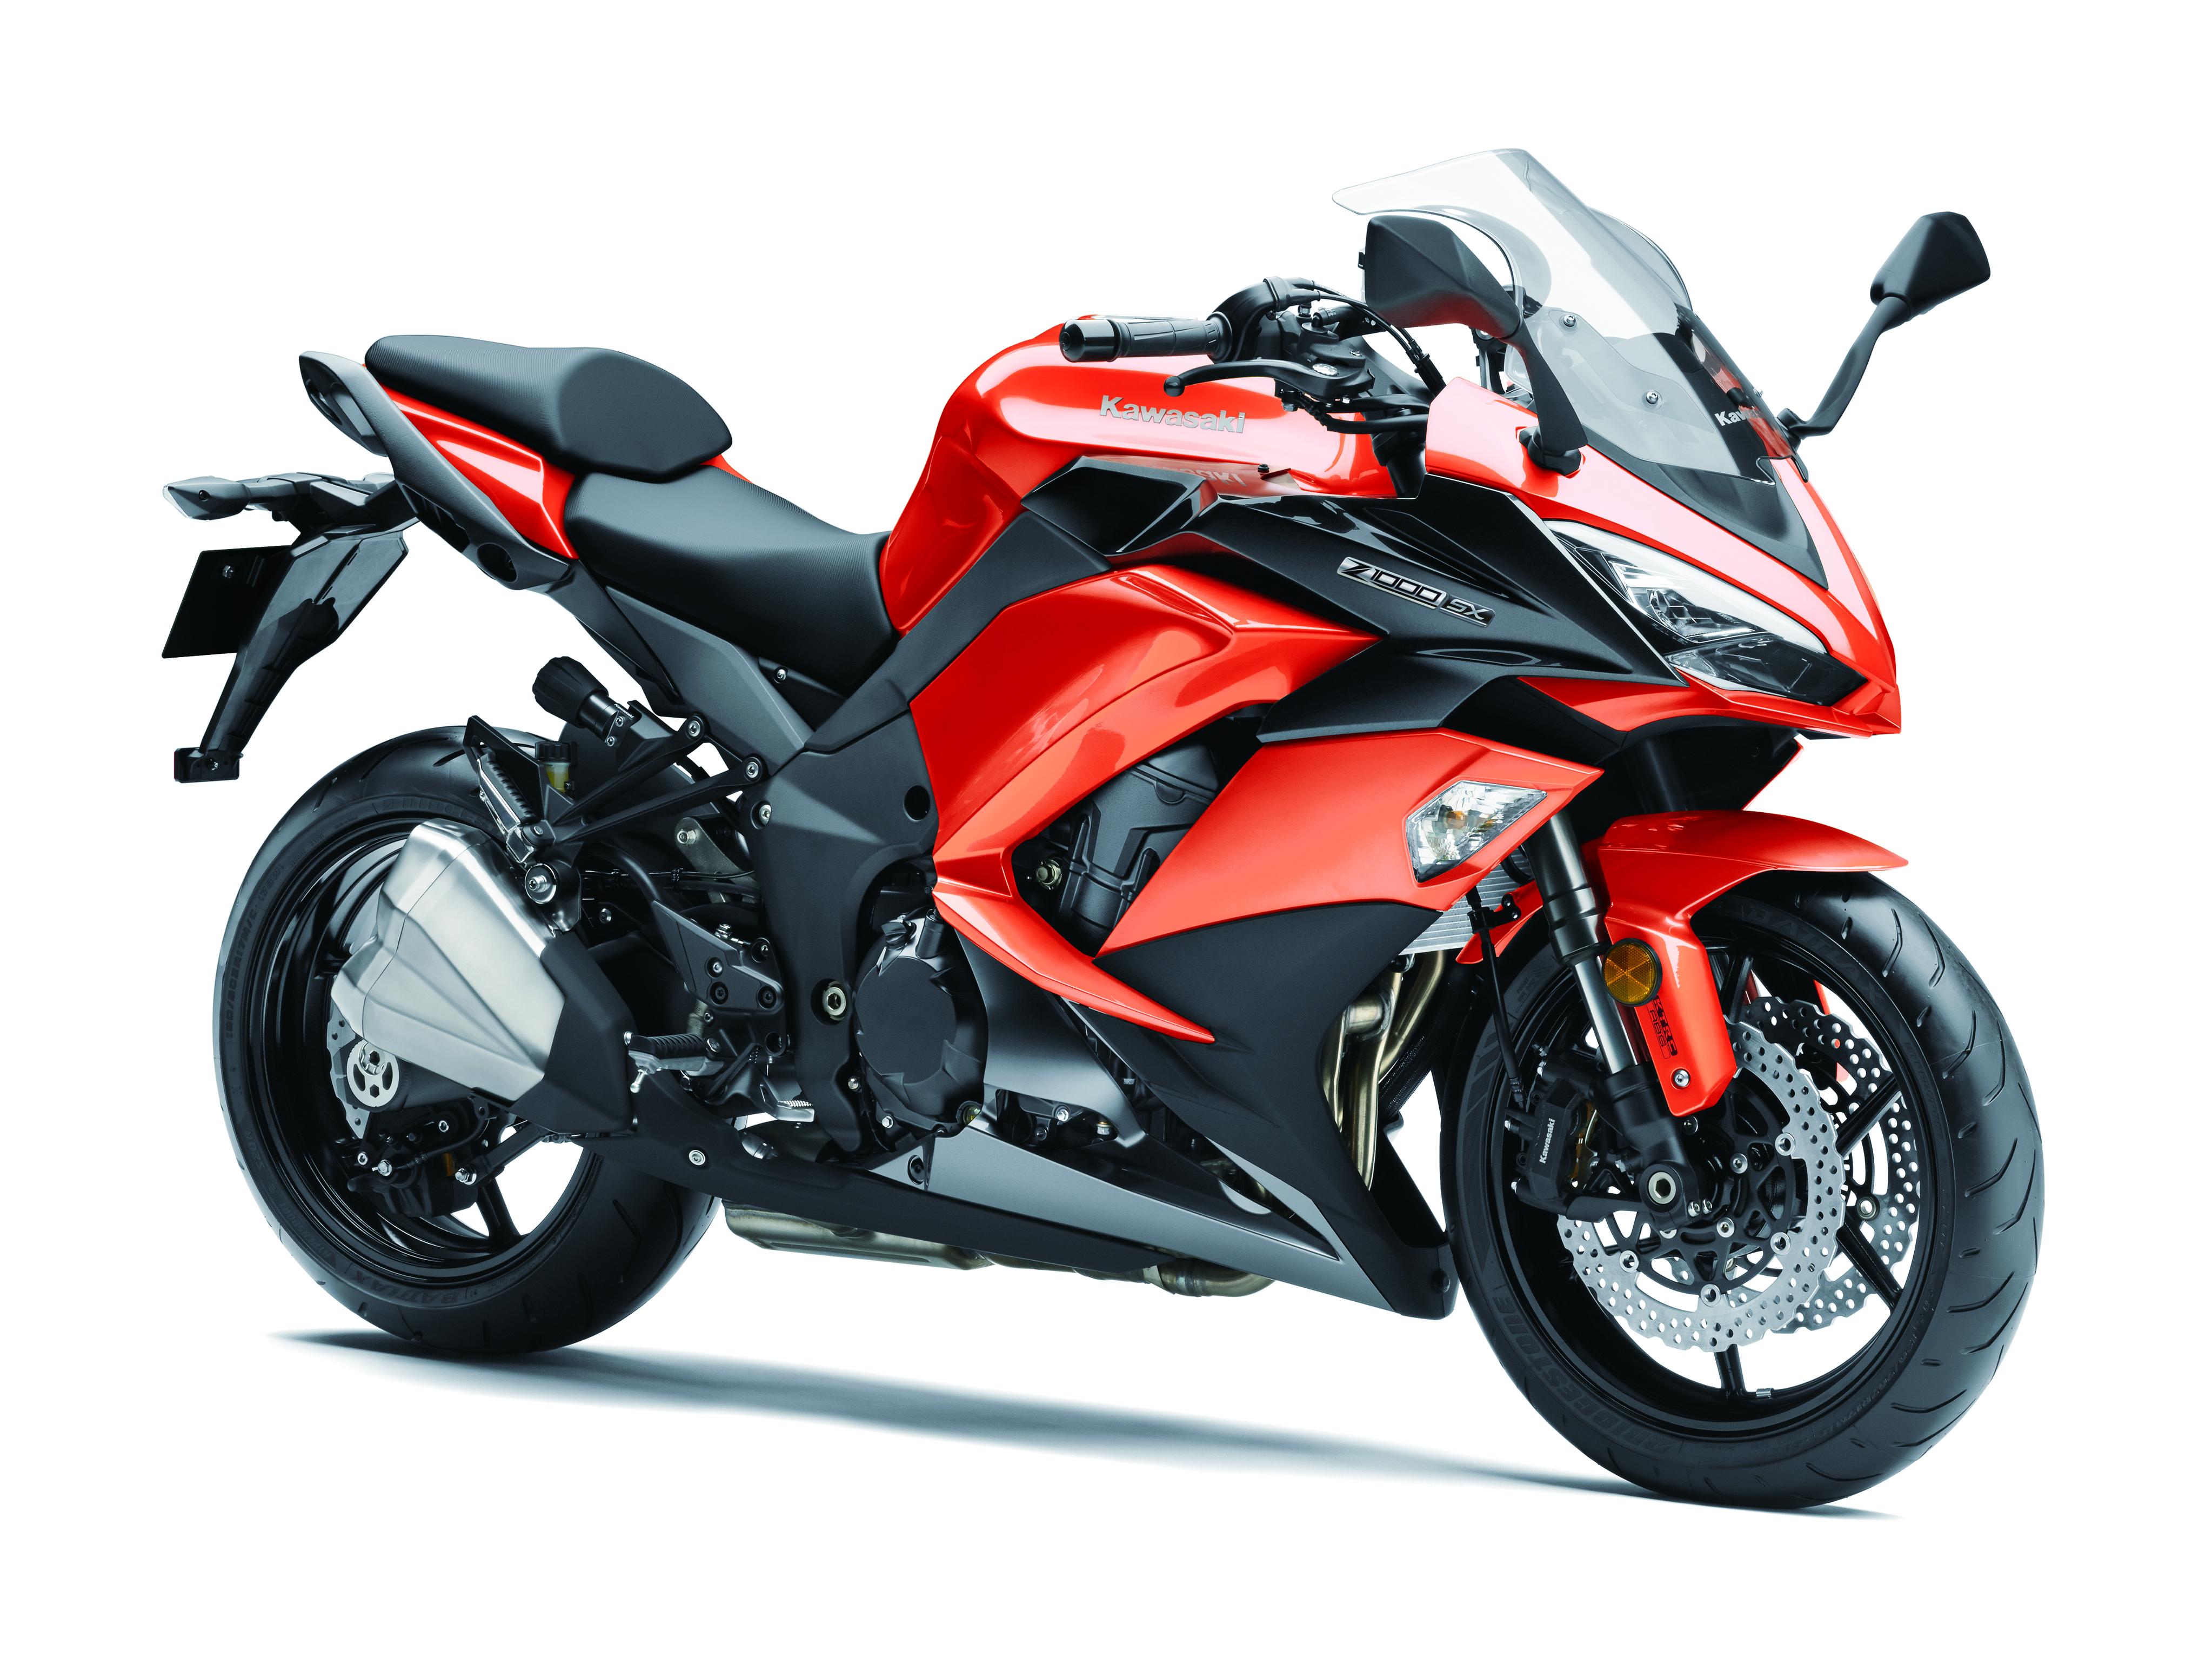 Kawasaki reveals updated Z1000SX